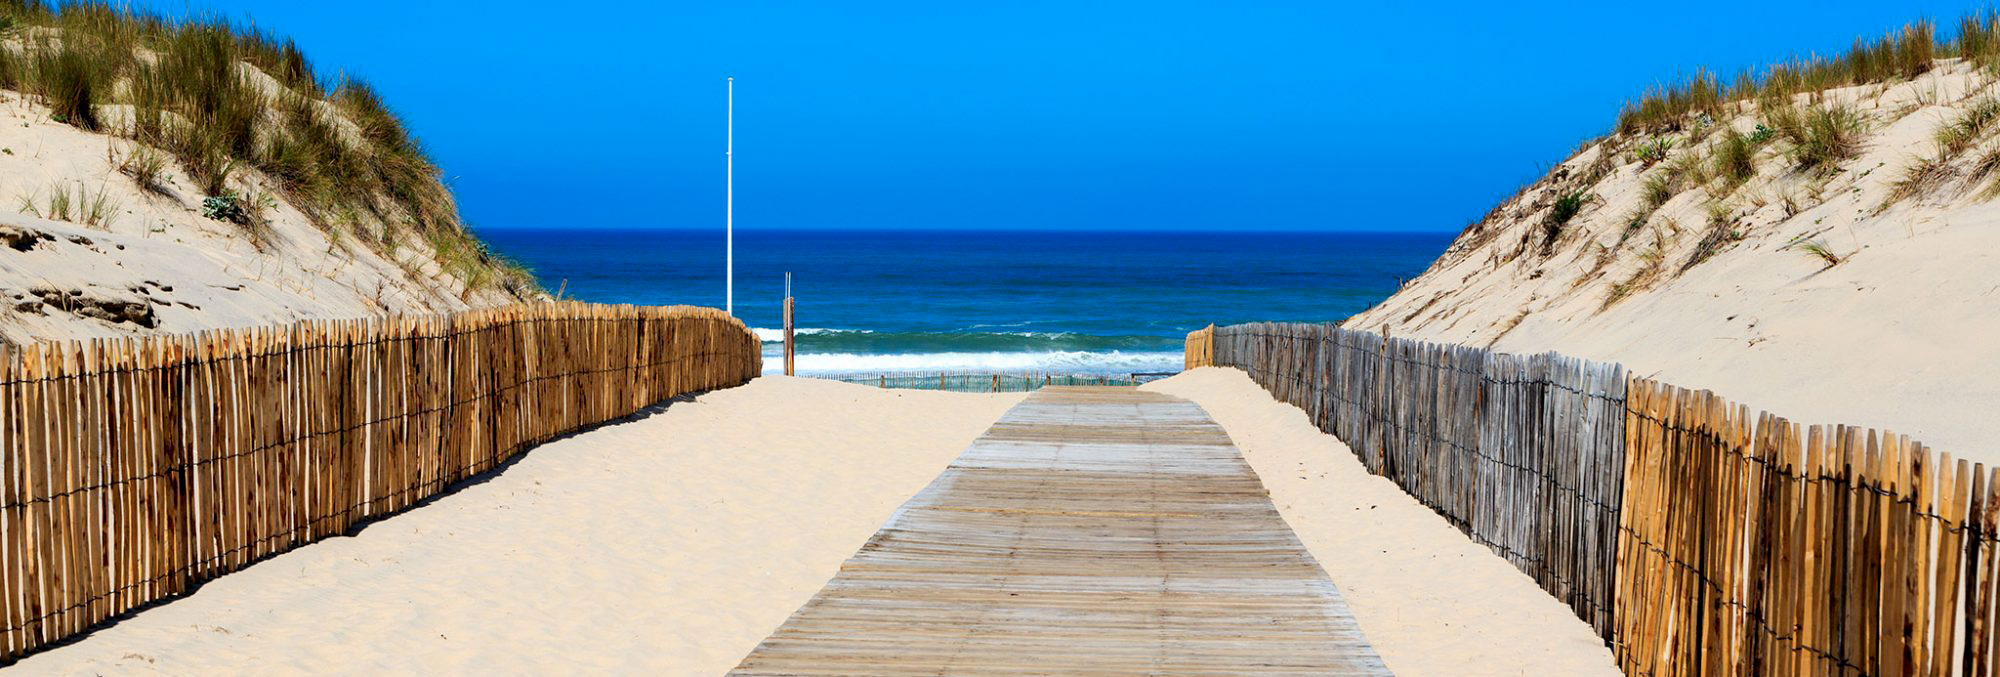 Chemin de sable vers la plage